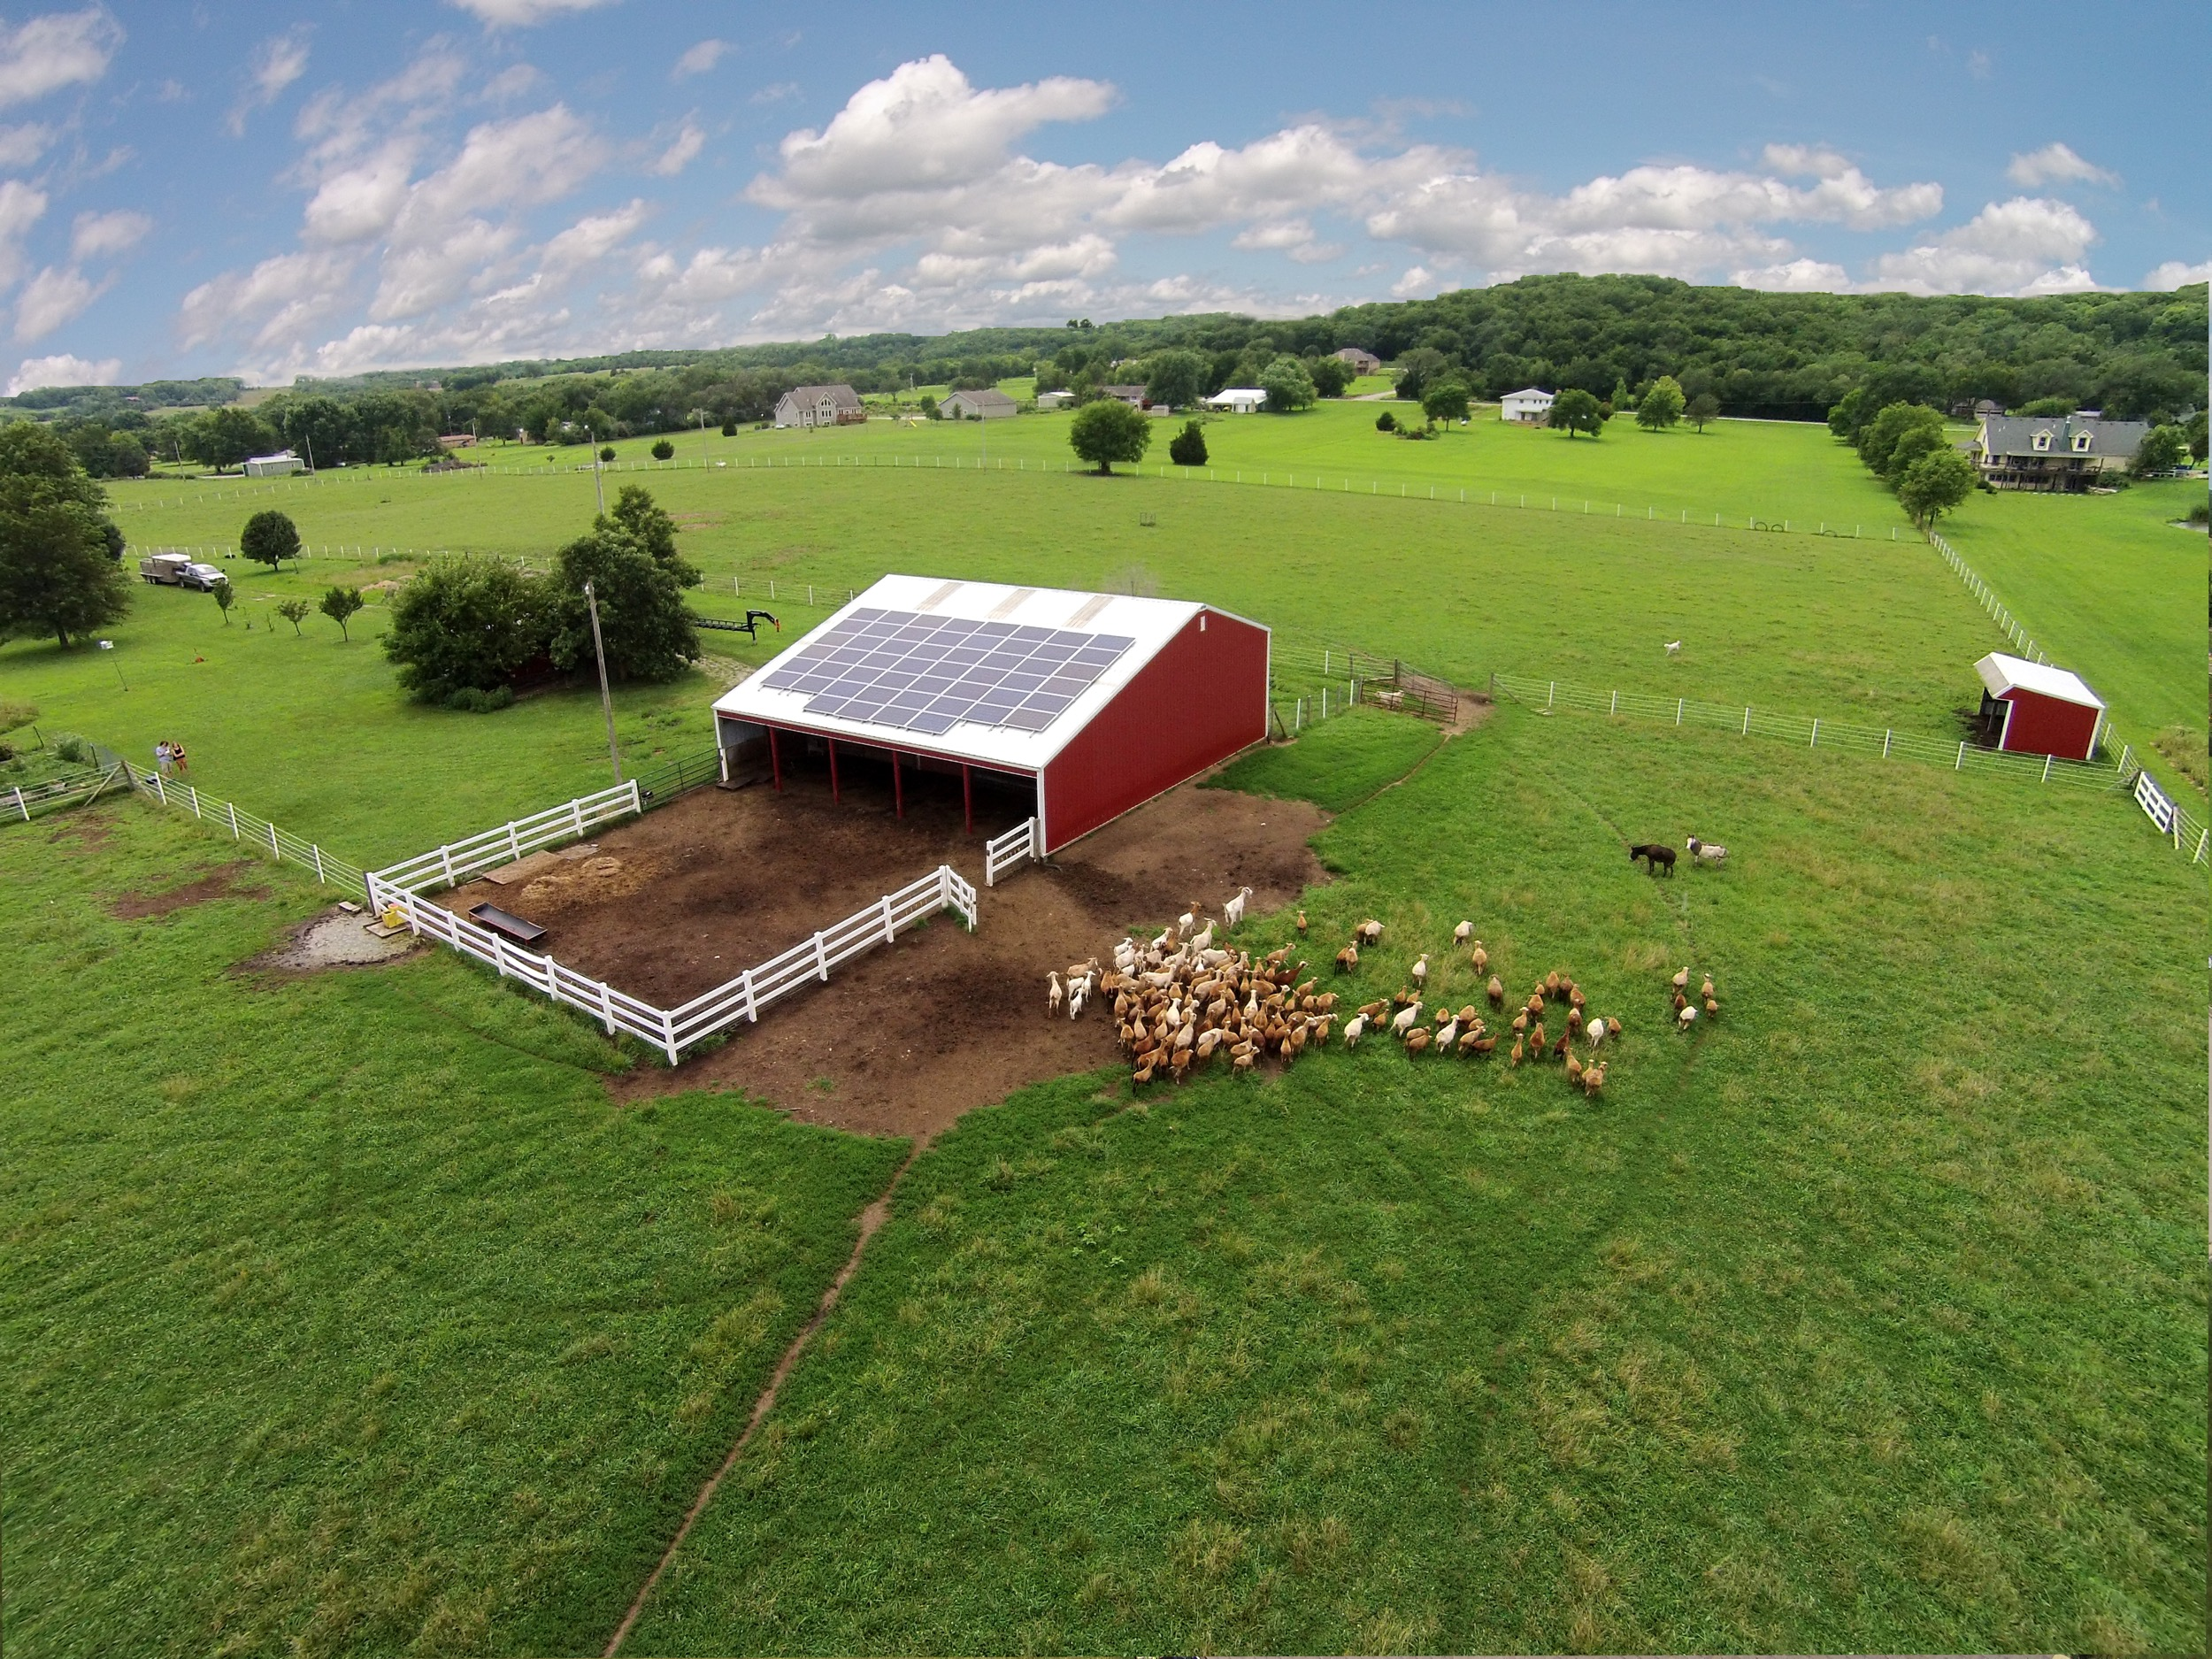 Solar array on an open-sided sheep barn © 2015 Cromwell Environmental